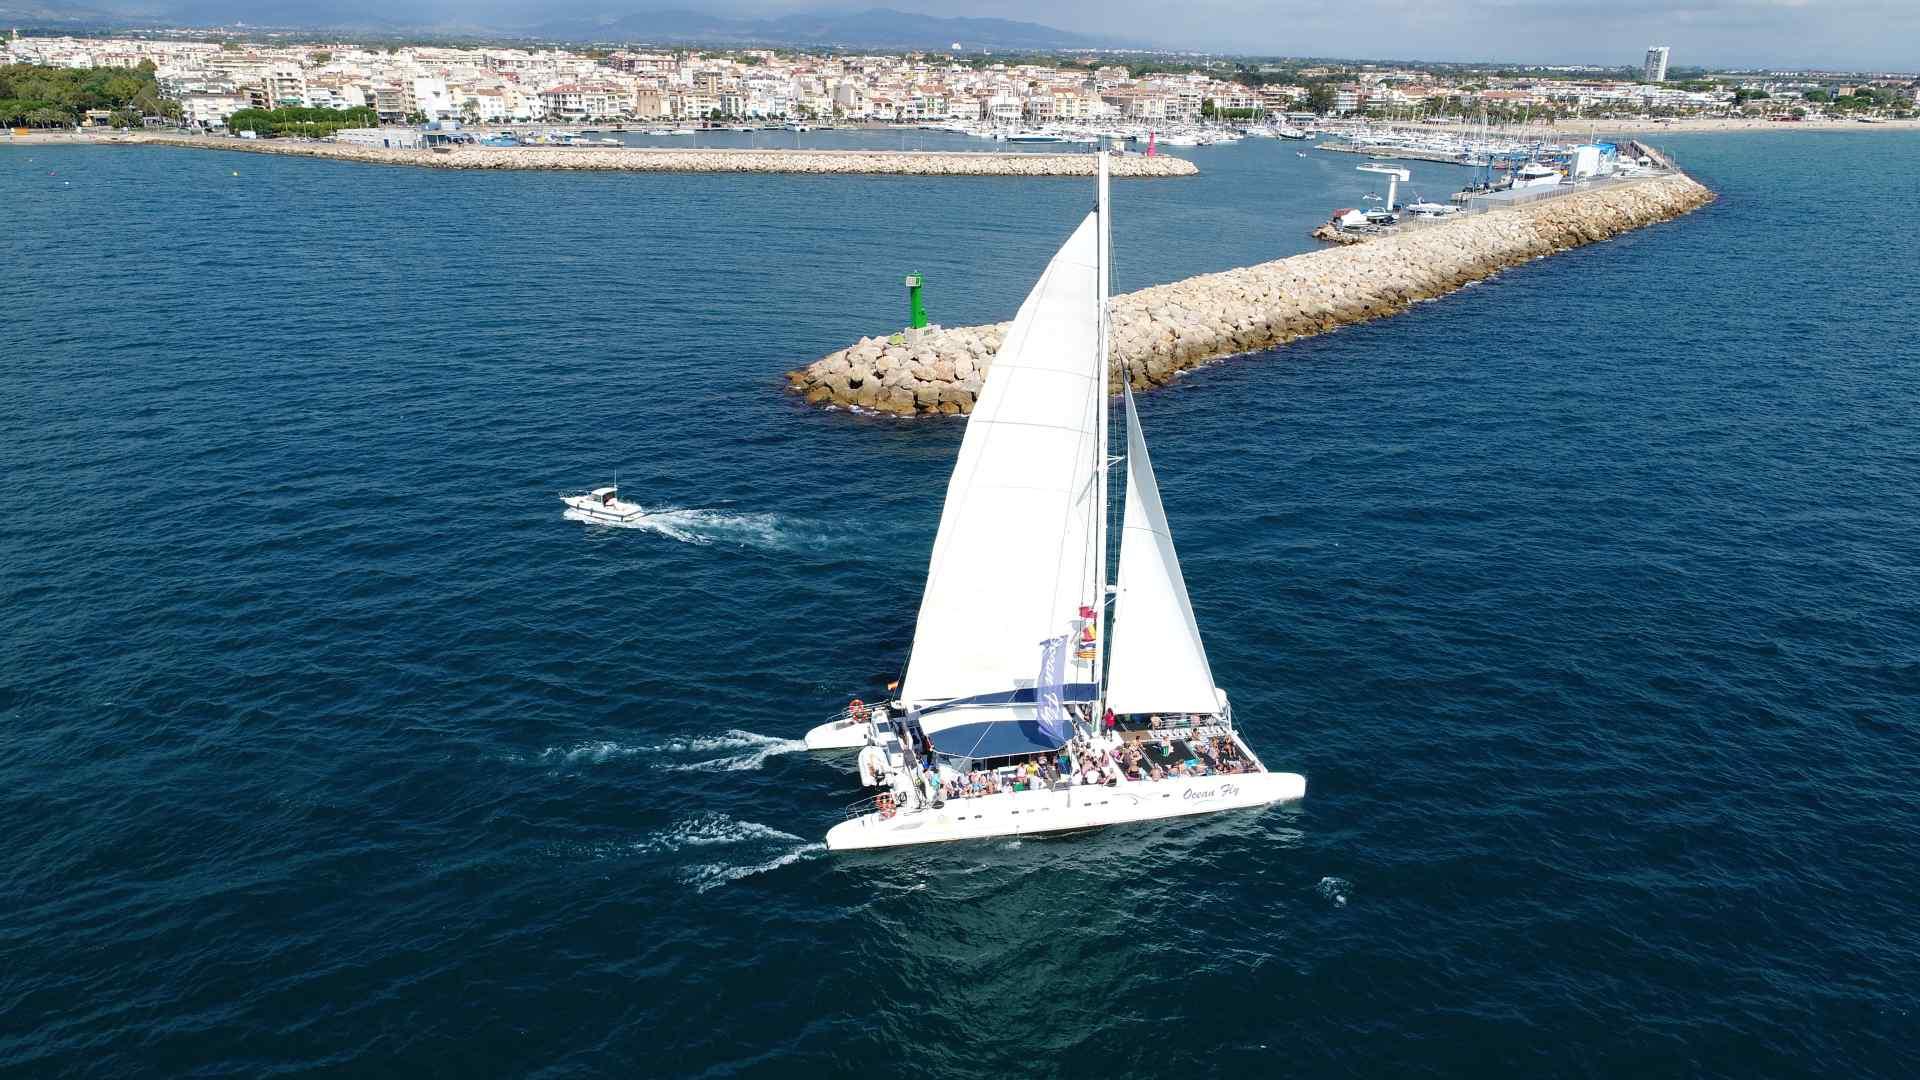 Catamaran Cambrils - catamaran-cambrils-1.jpg